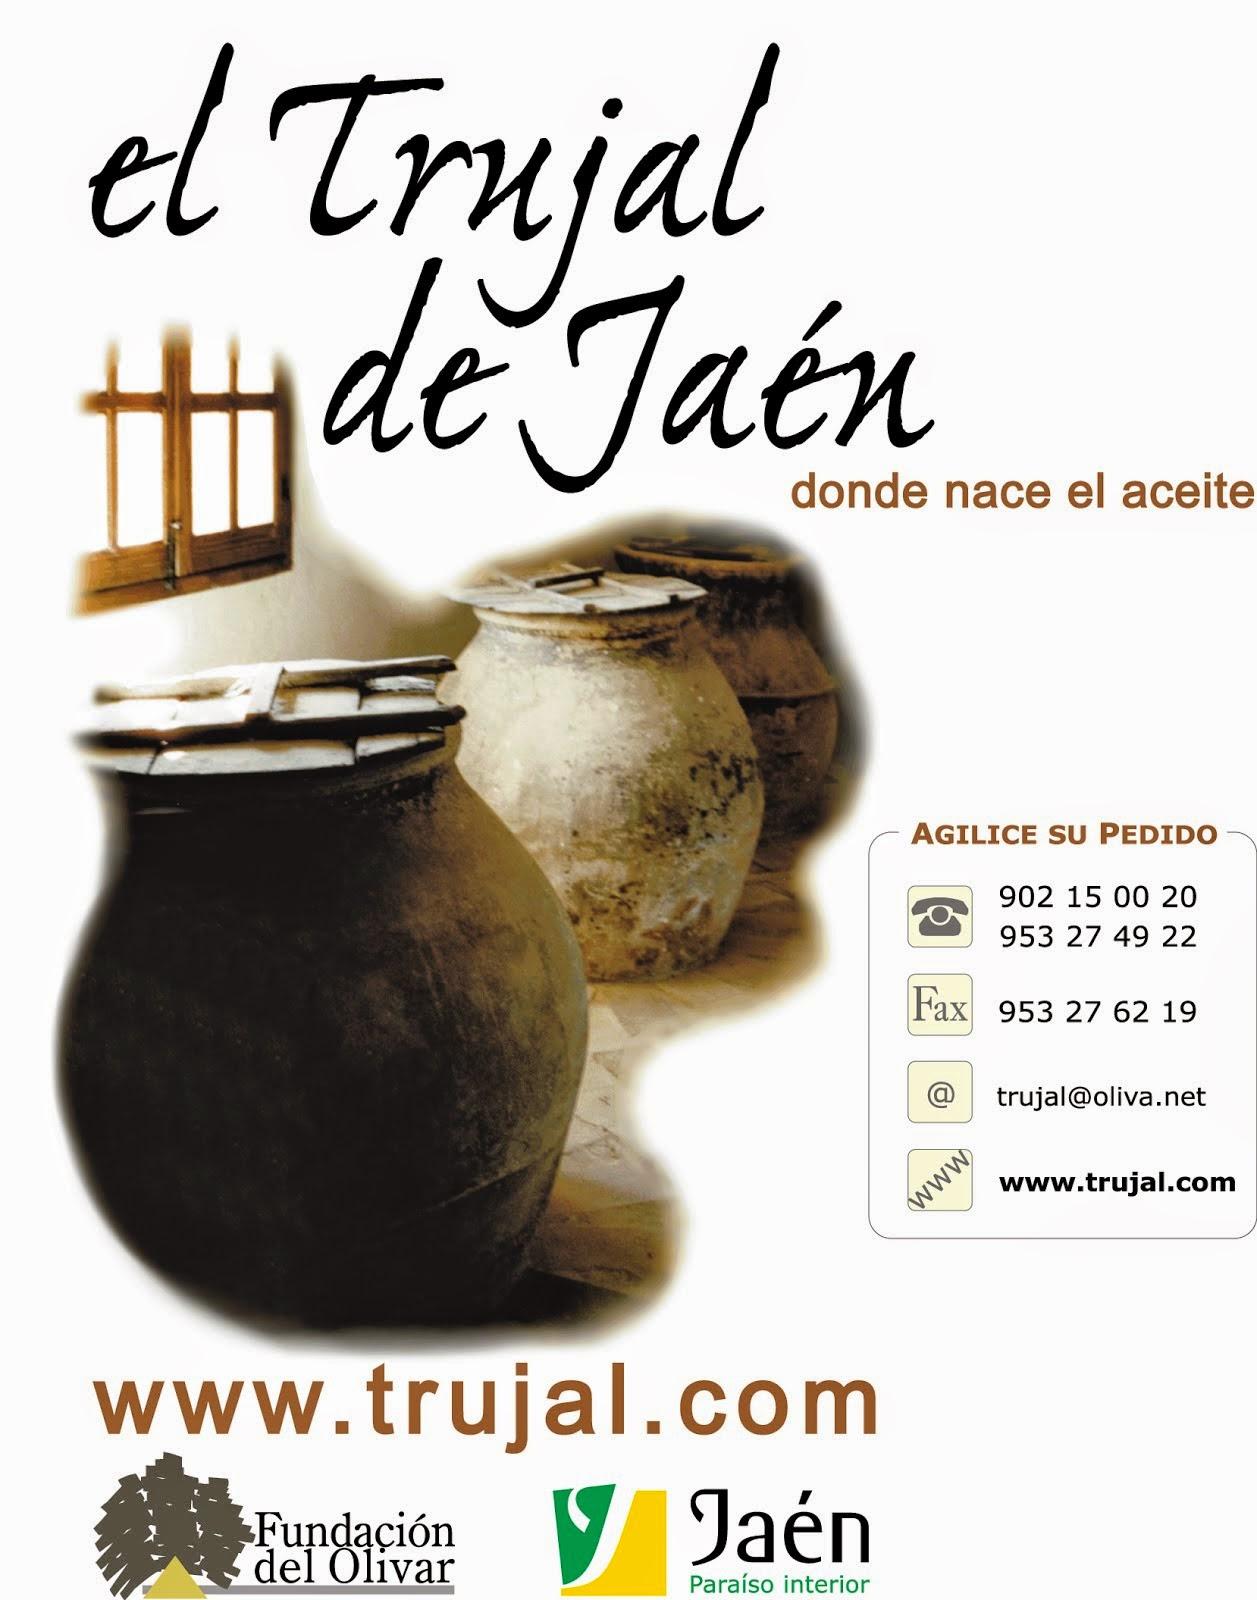 www.trujal.com